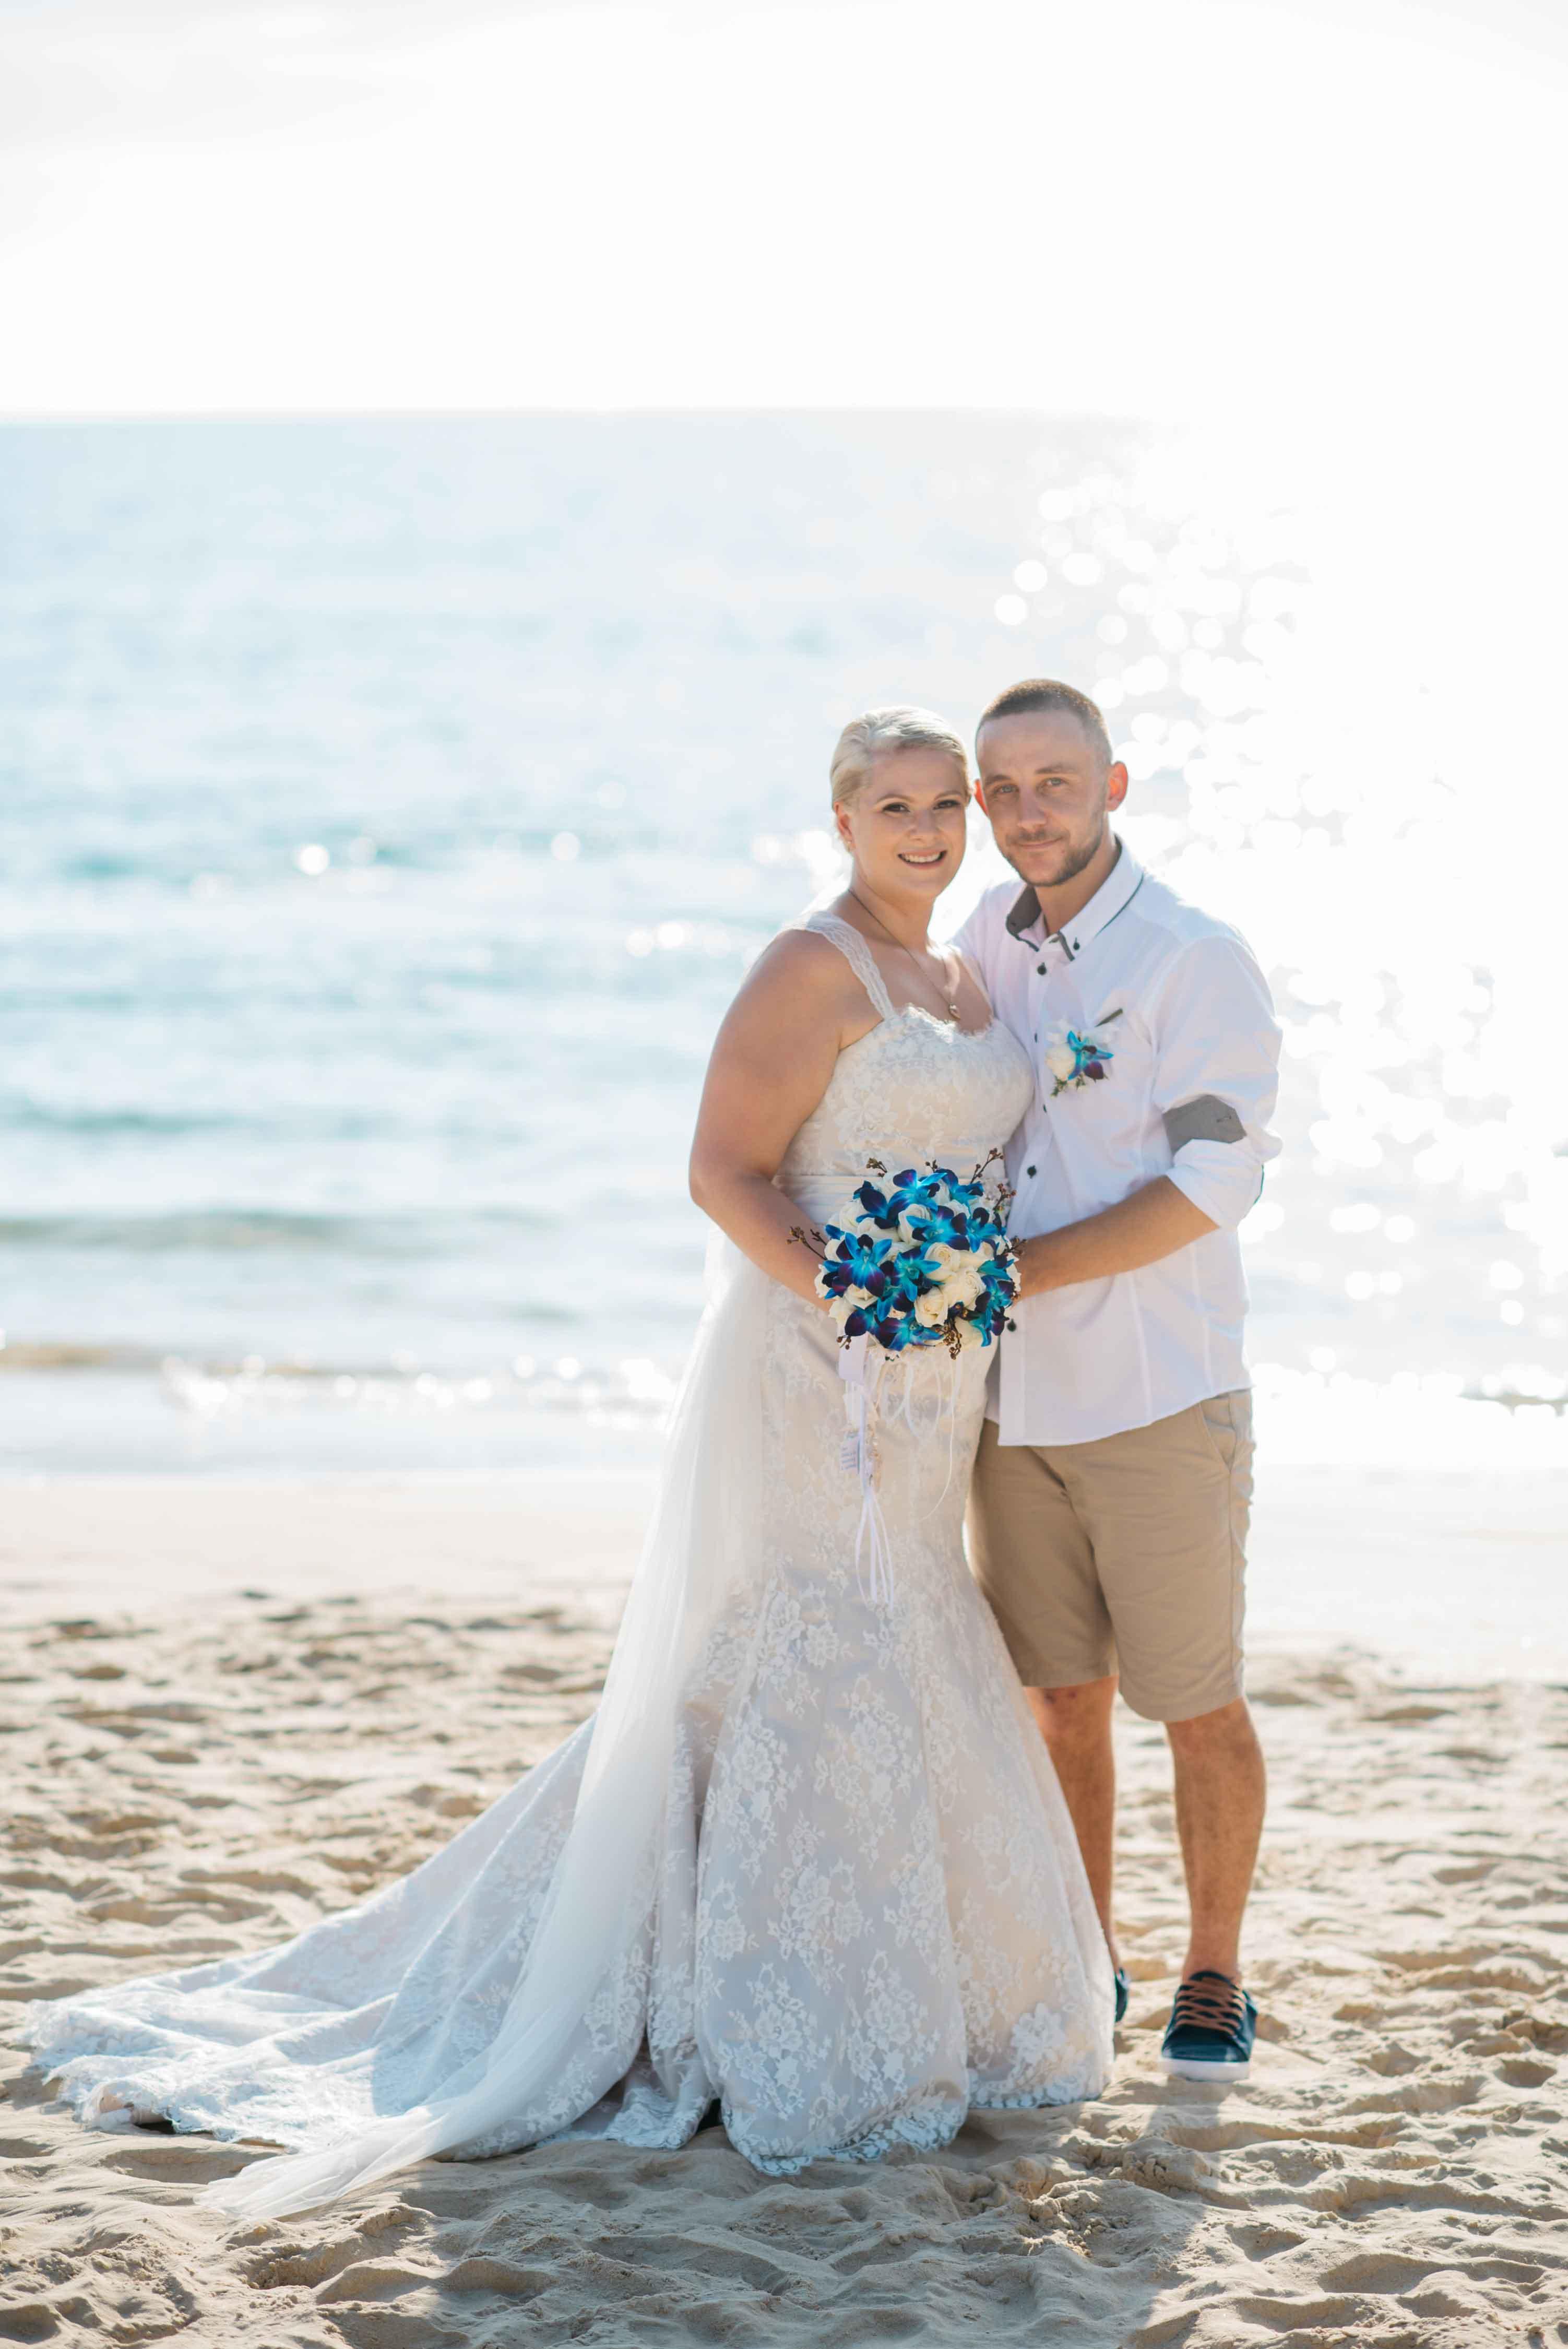 Centara-Grand-Beach-Resort-Kahlia-Luke-Wedding-02